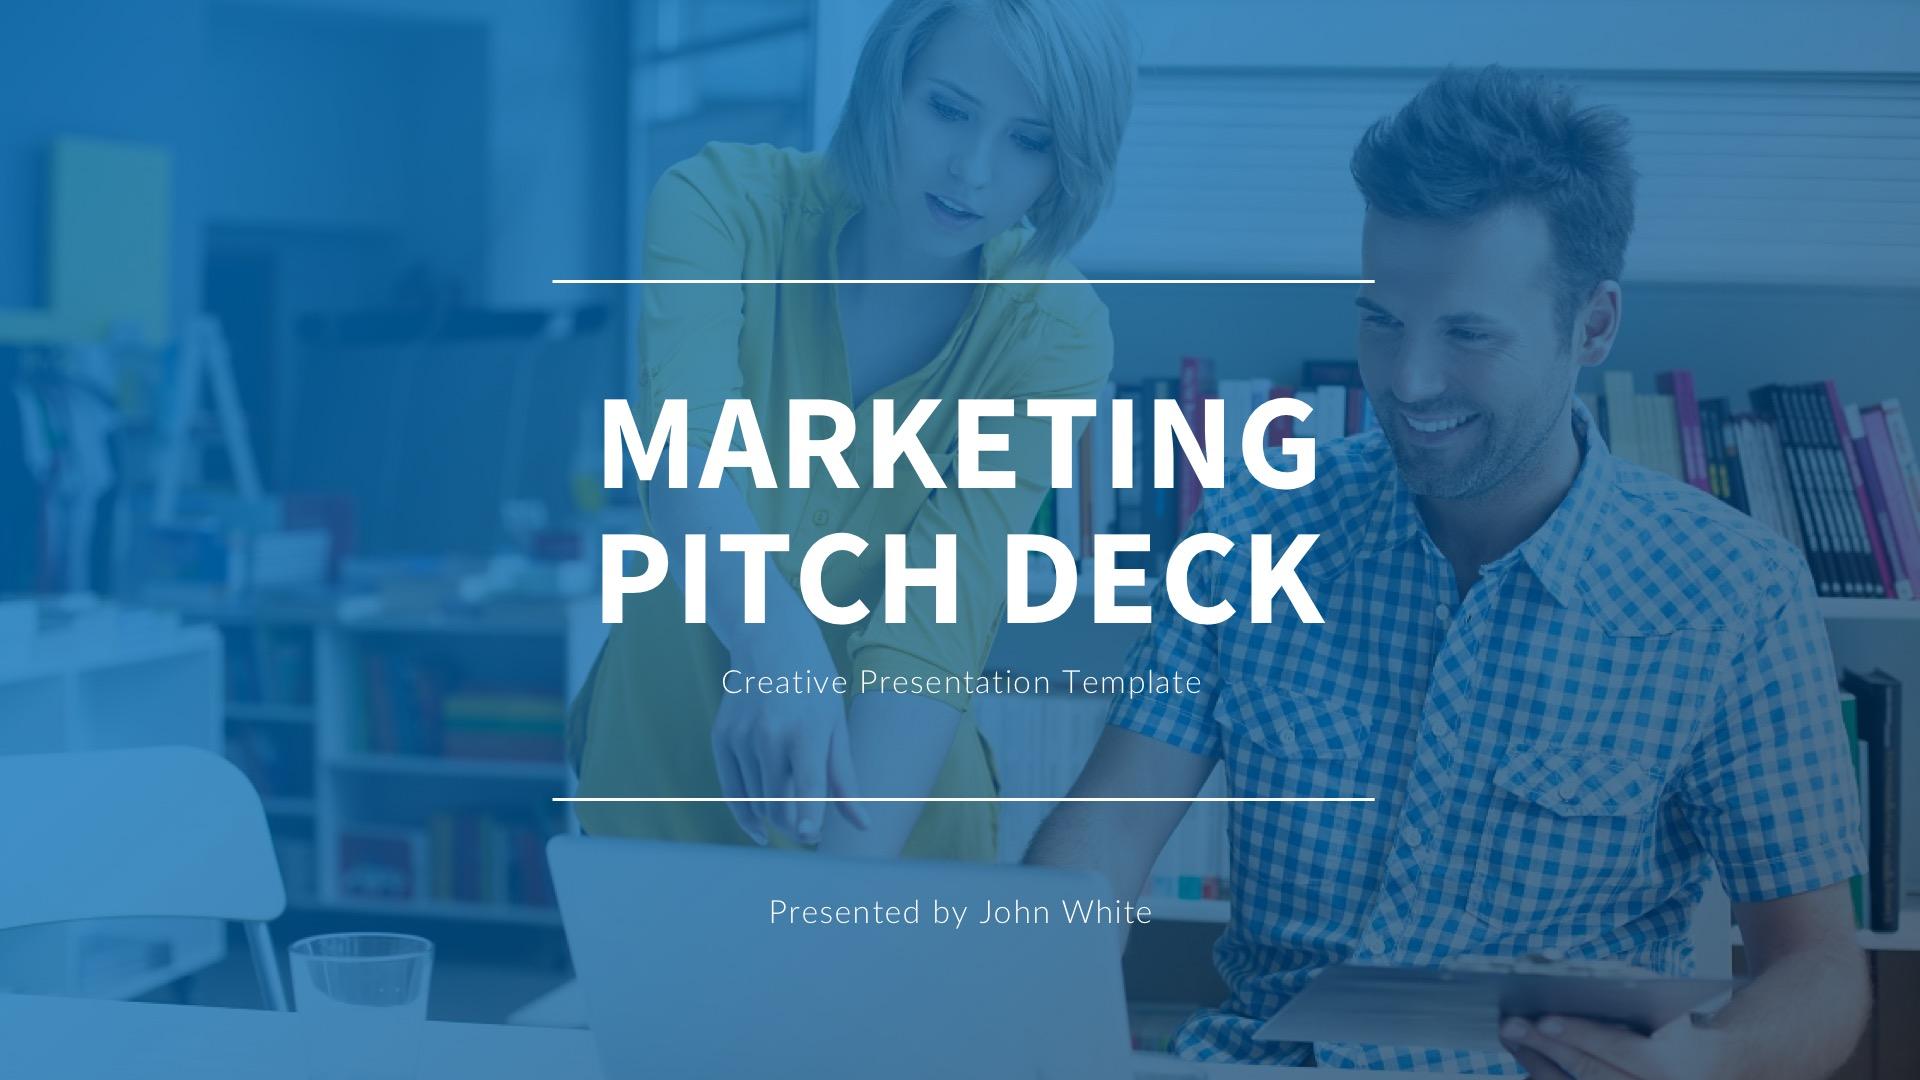 Marketing Pitch Deck Google Slides Template